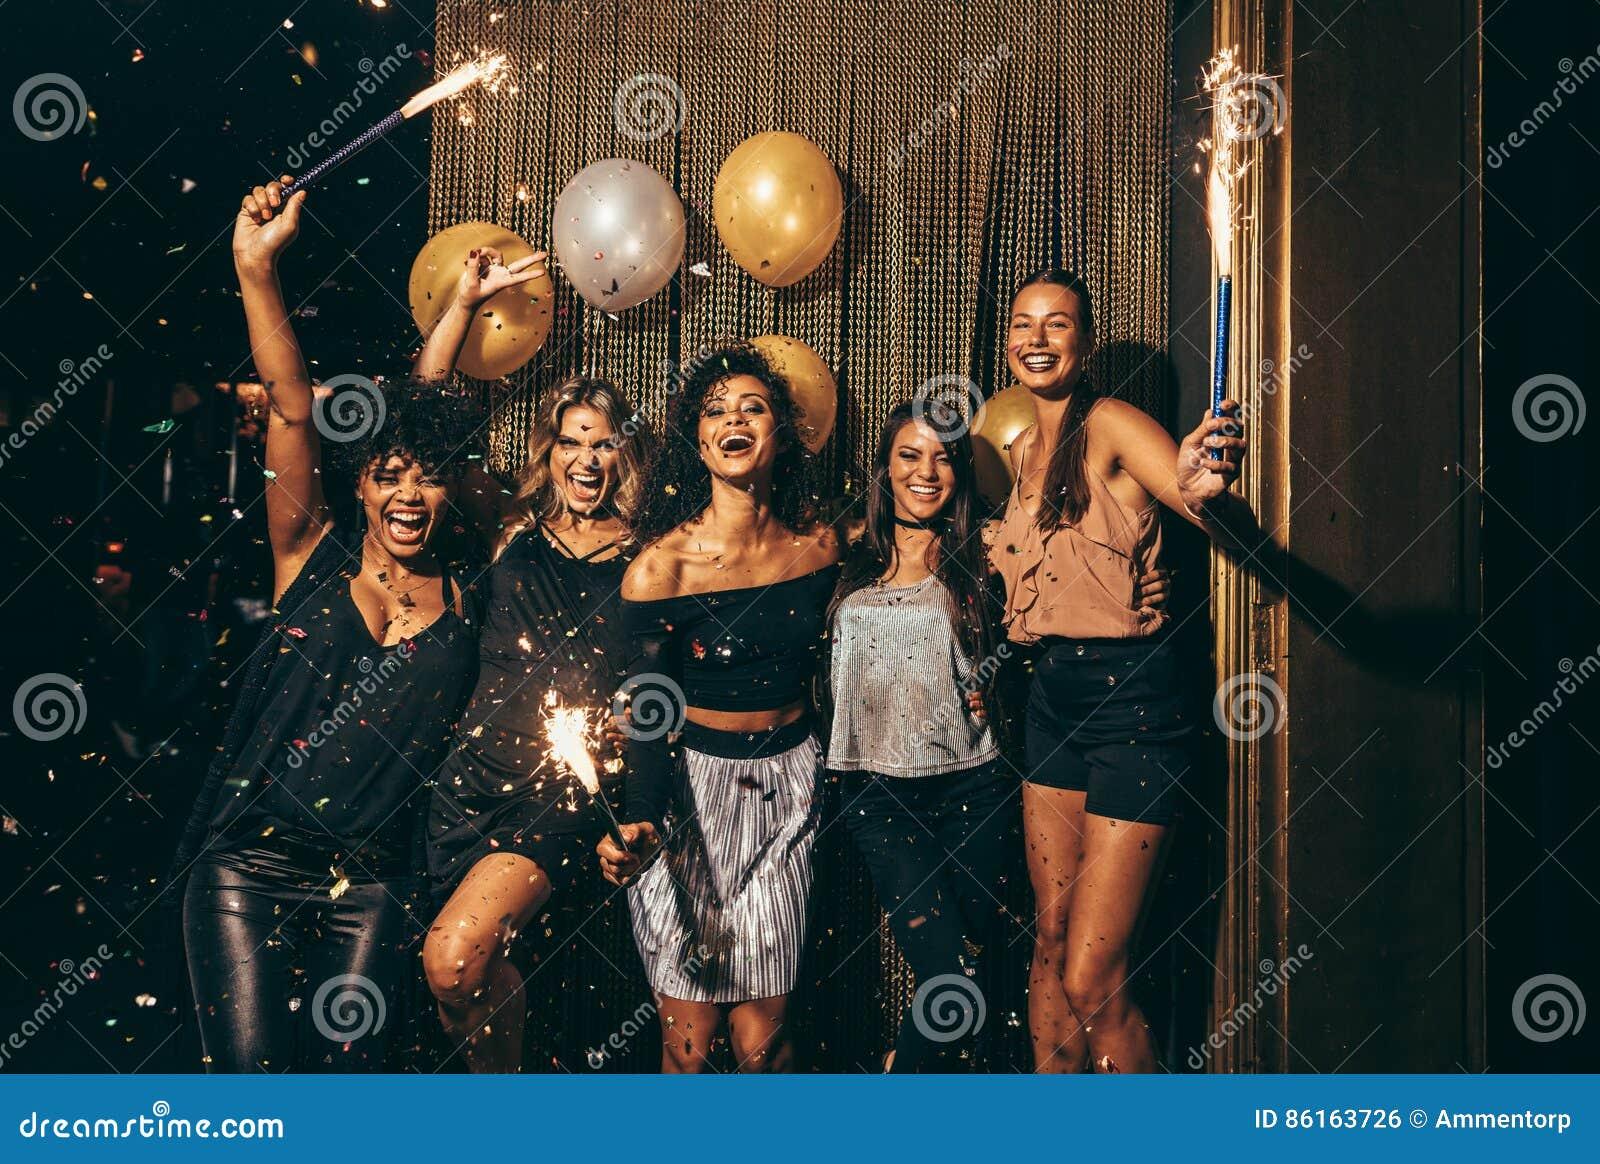 Groep vrouwen die partij hebben bij nachtclub